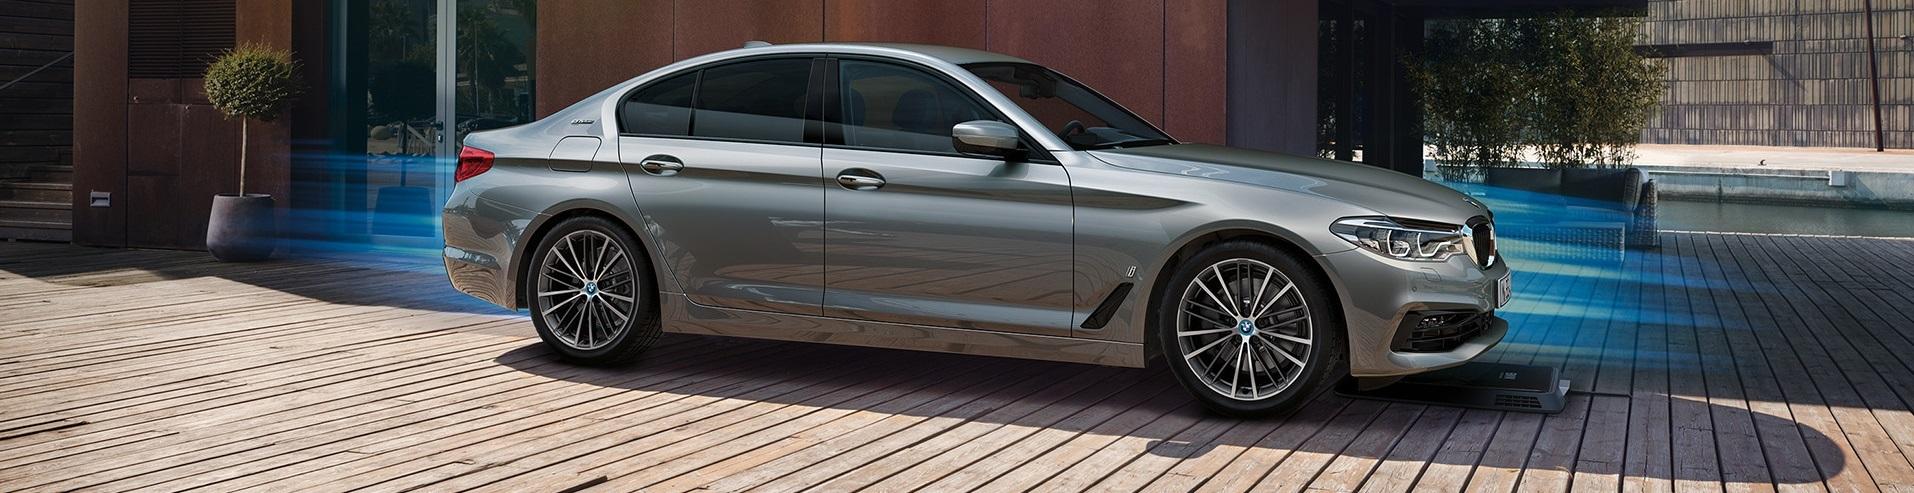 BMW 5 Series E Hybrid